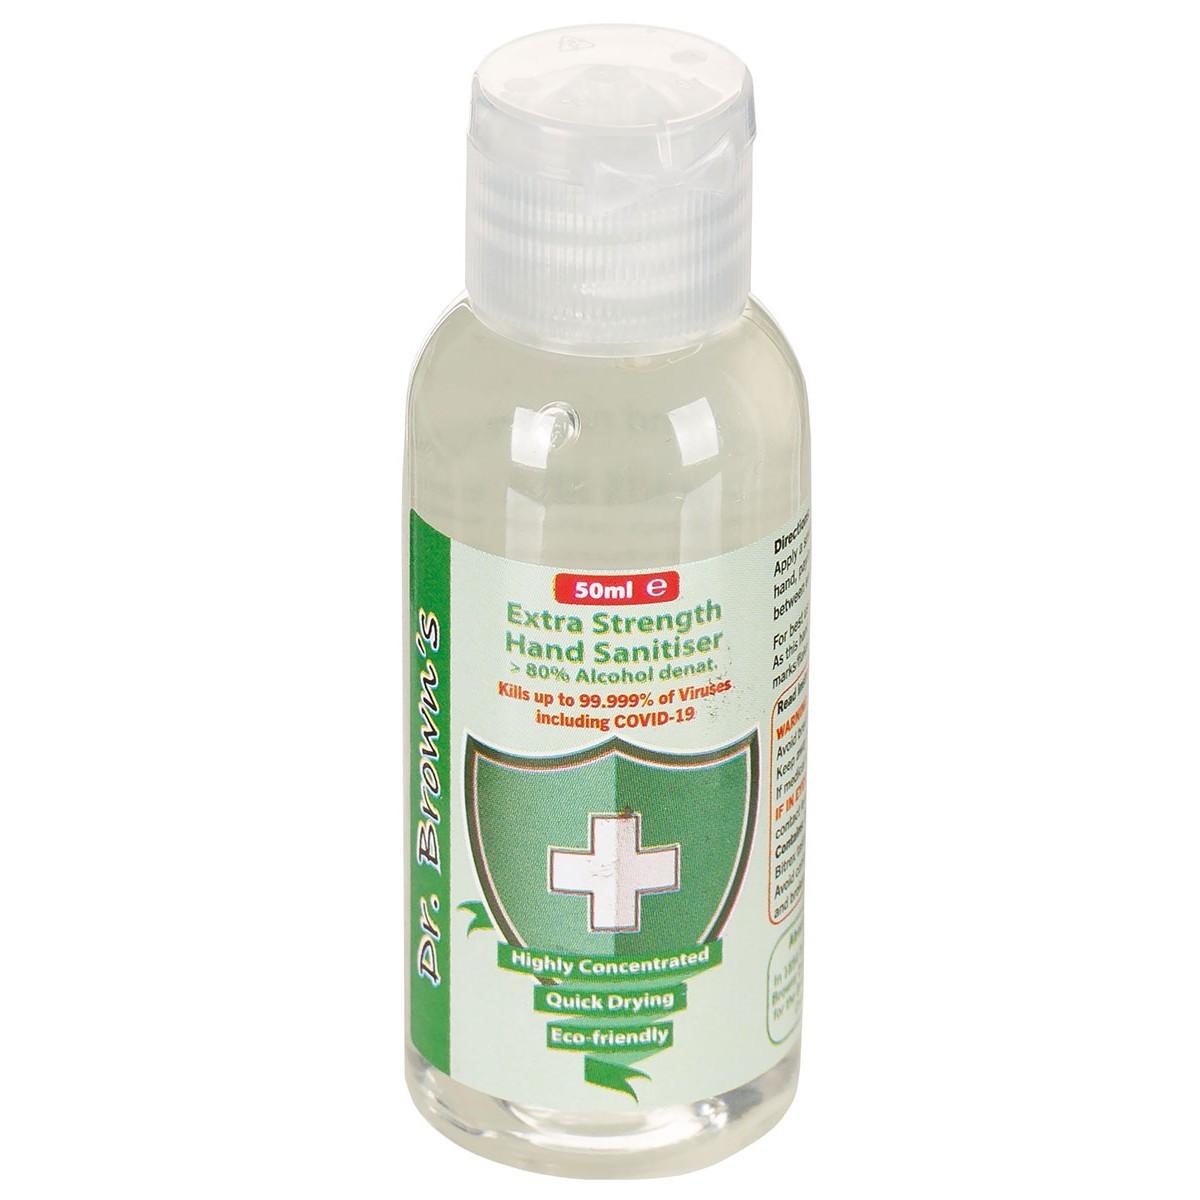 Dr. Brown's Desinfektionsmittel BCB Gel 50ml